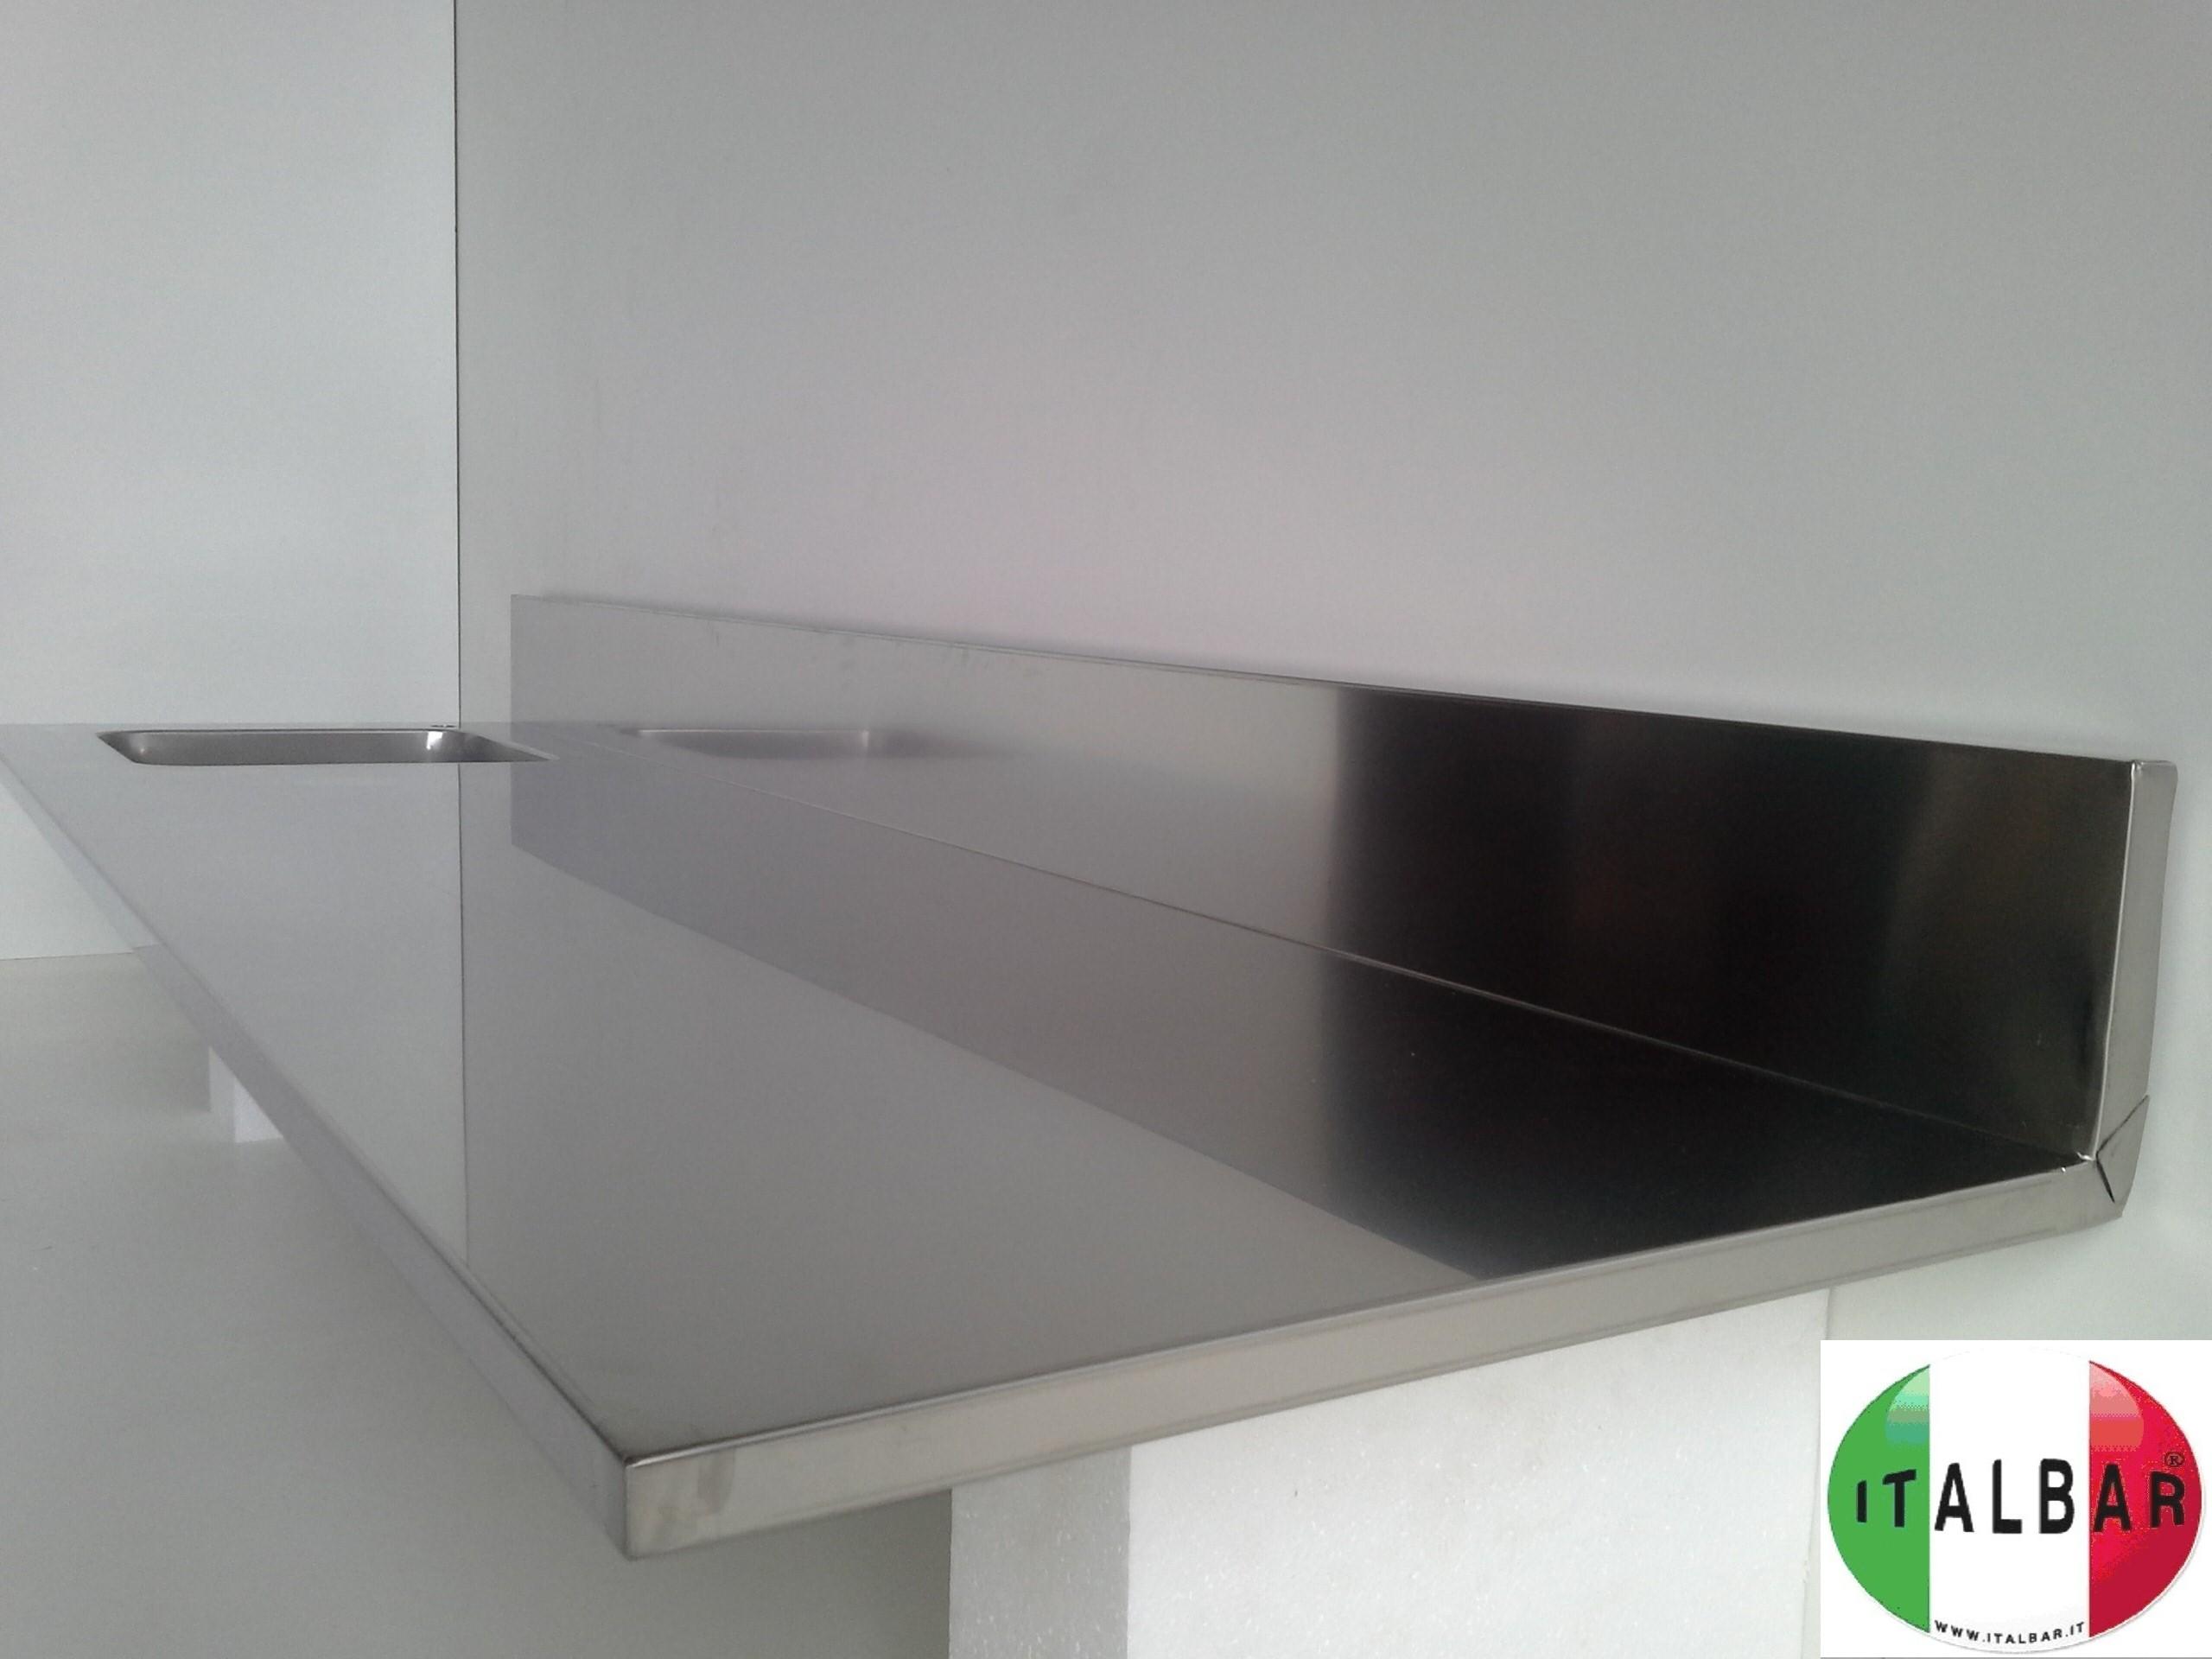 Banchi frigo banchi bar banconi bar produttori di - Piani in acciaio per cucine ...